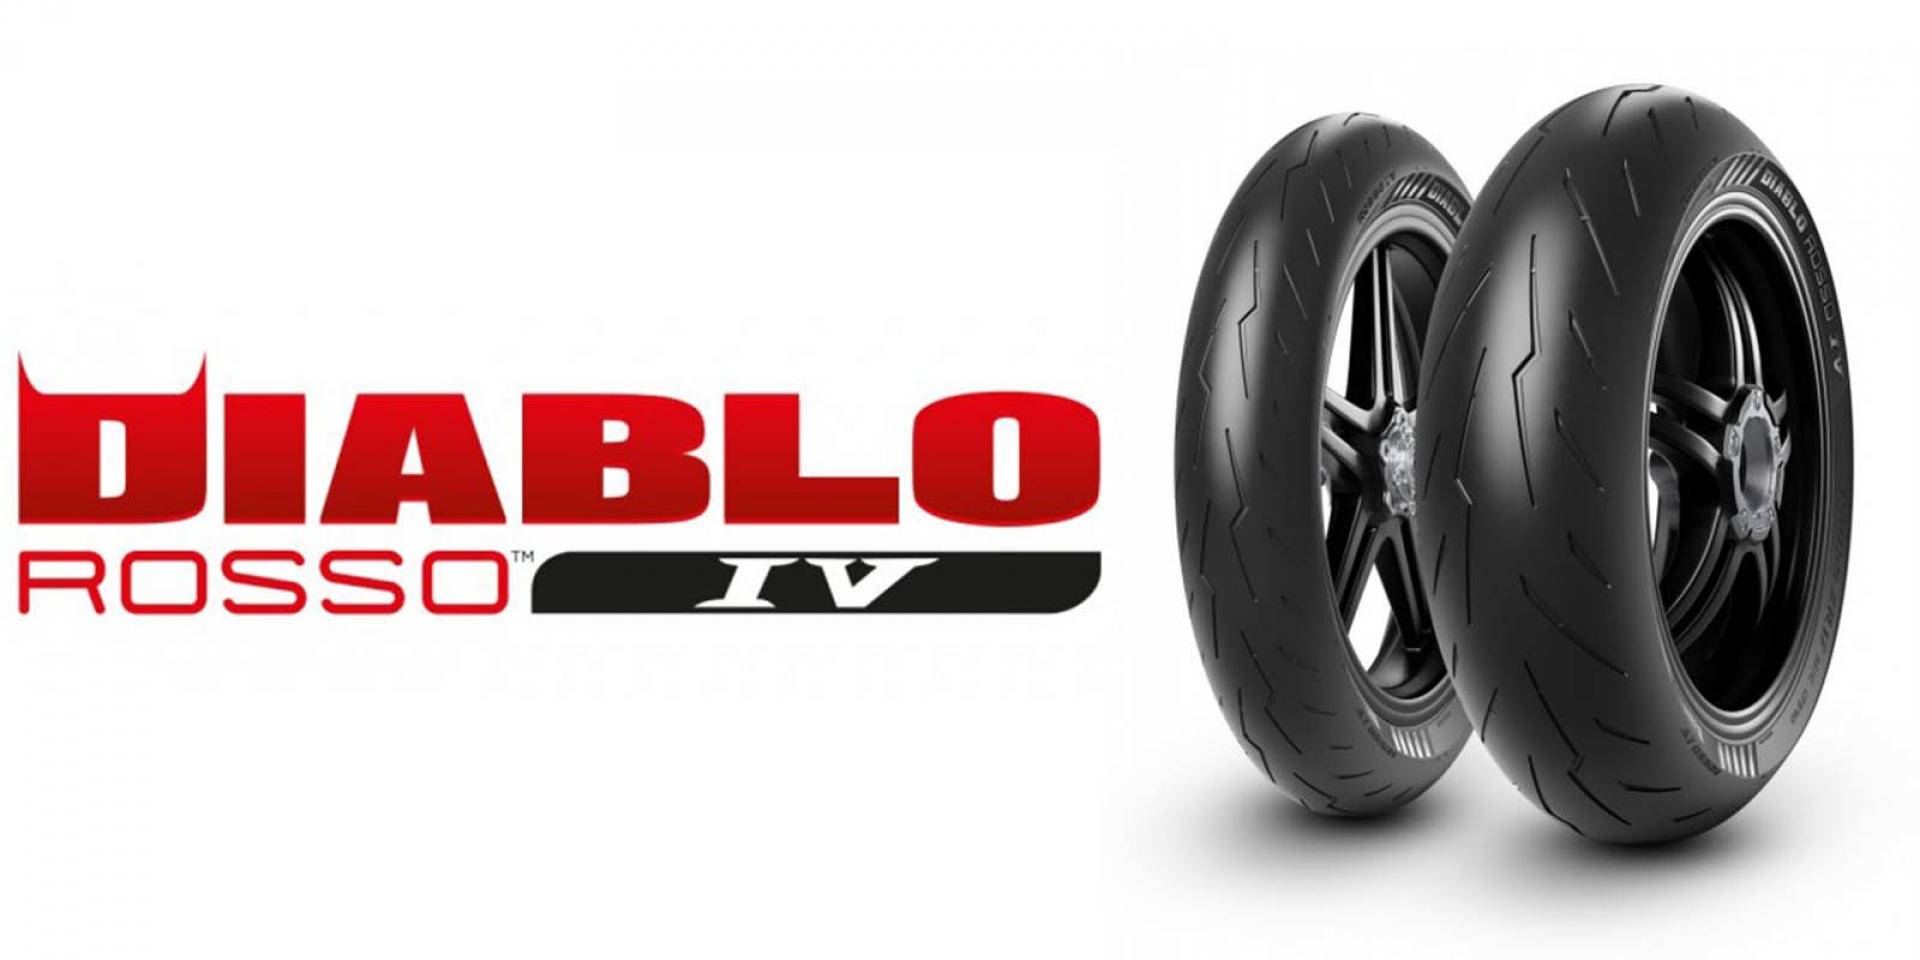 Rosso IV即將來襲!Pirelli DIABLO系列迎來500萬條里程碑